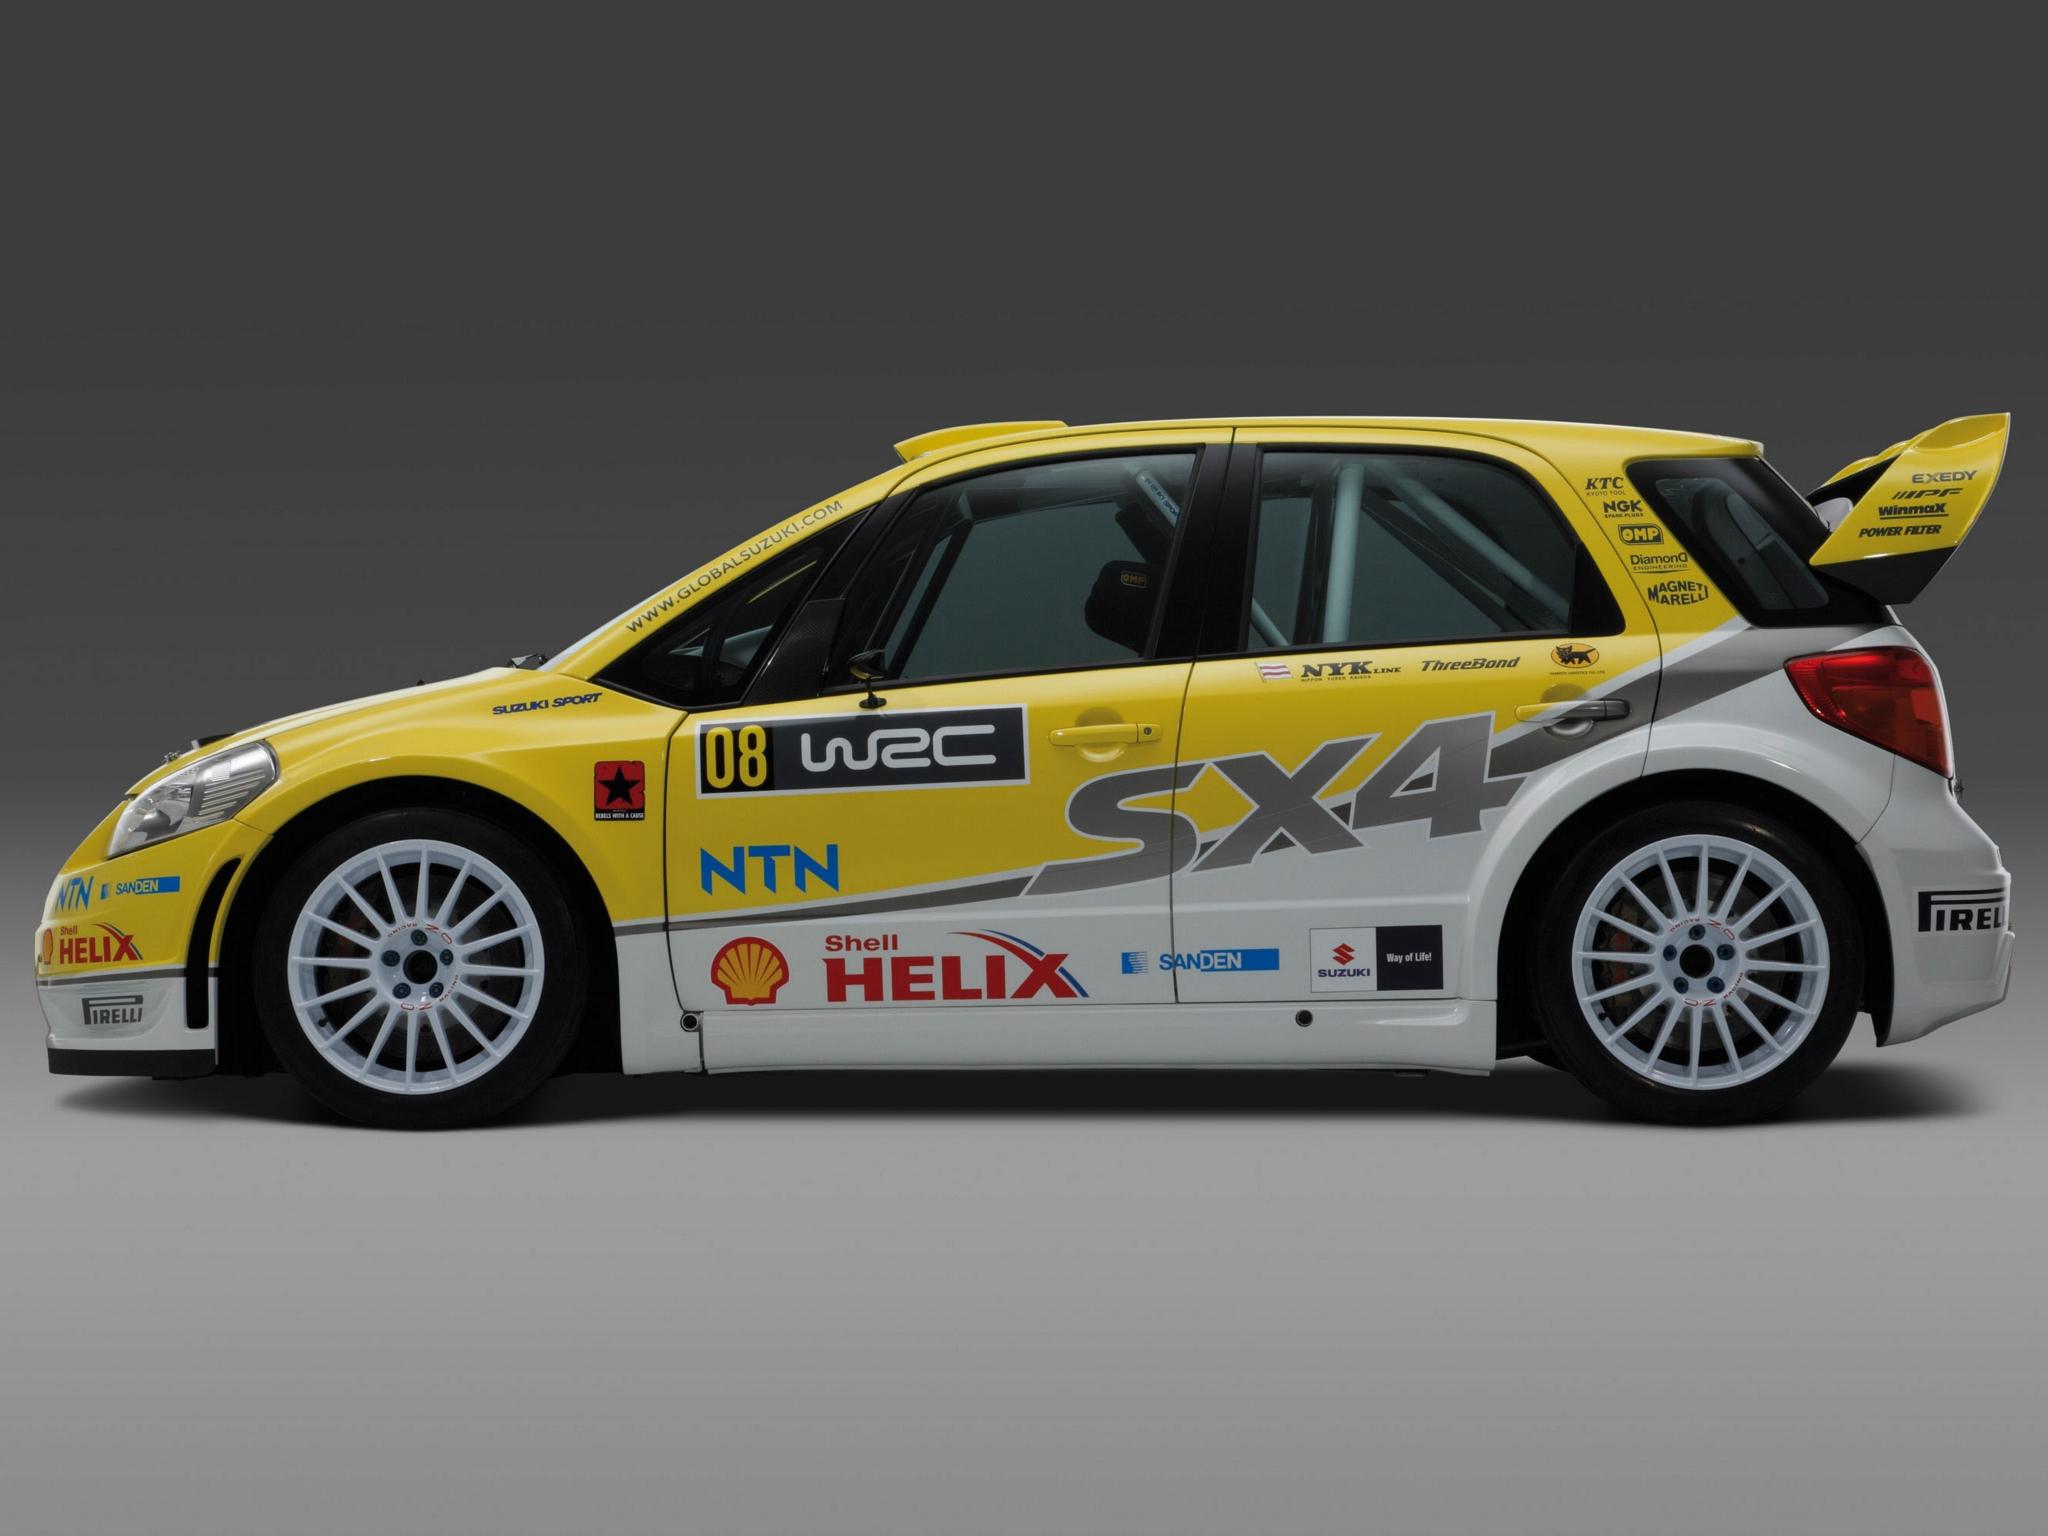 Suzuki Sx Wrc Specs